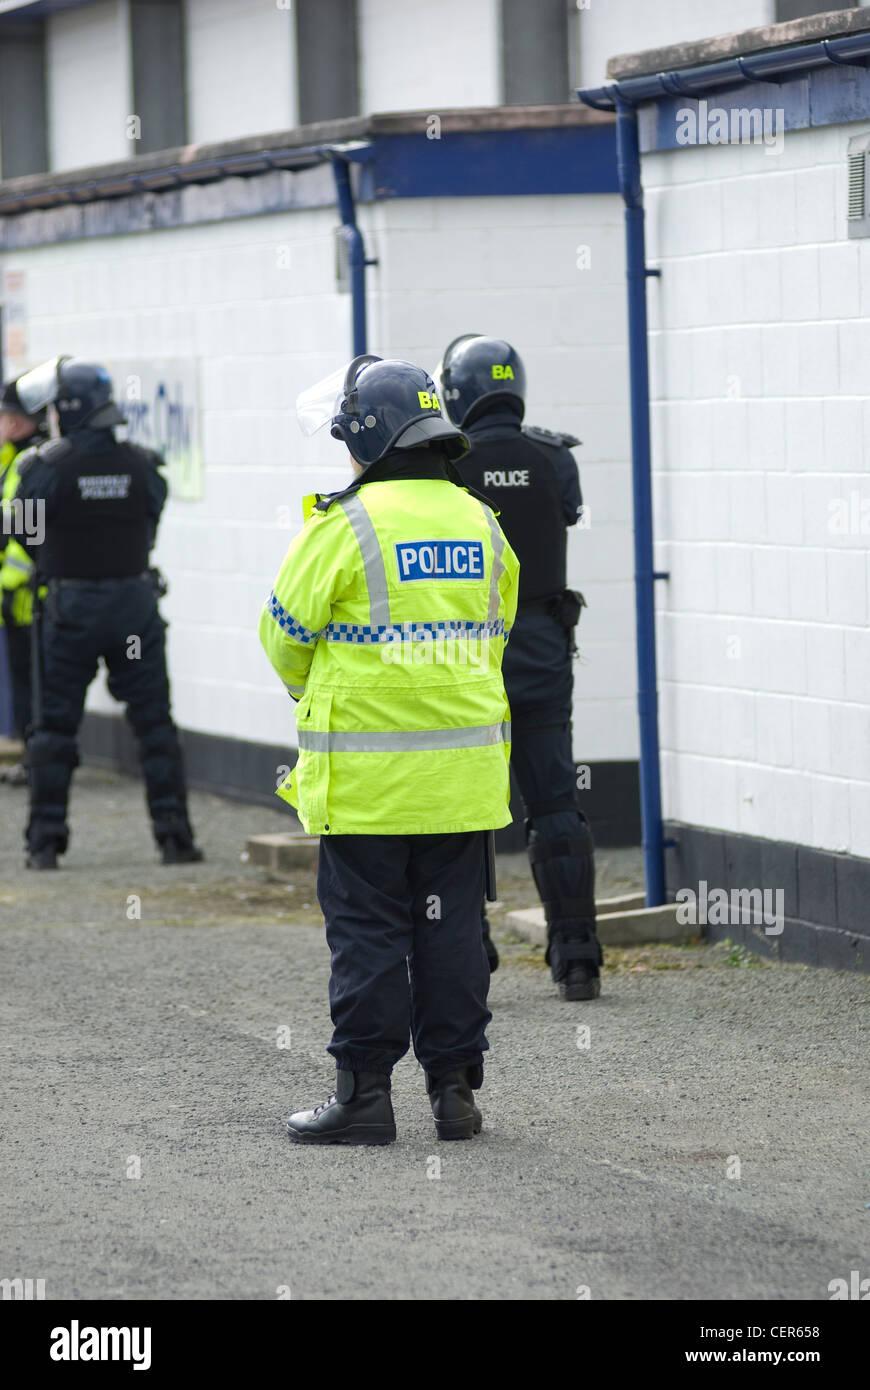 Uk riot police at the scene of a civil disturbance - Stock Image